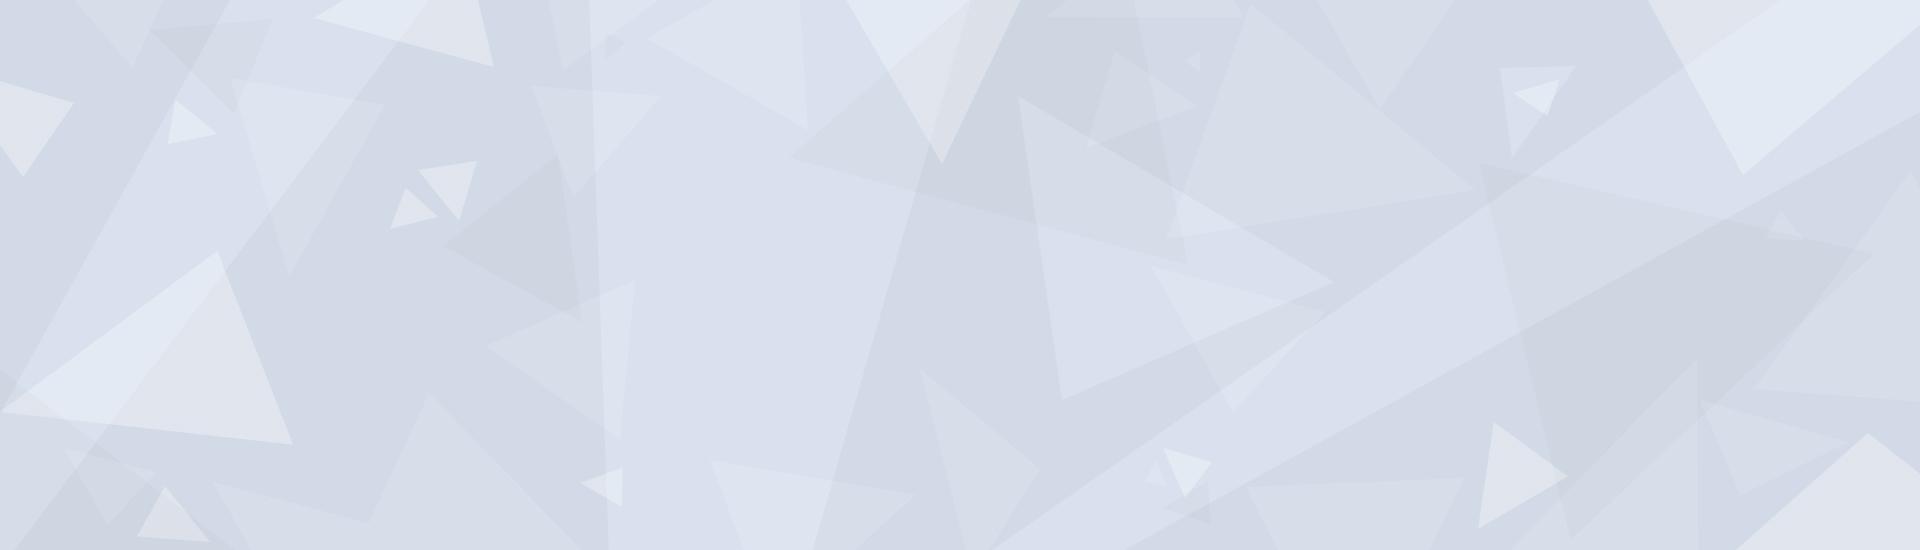 Khaal - VSLeague Online eSport